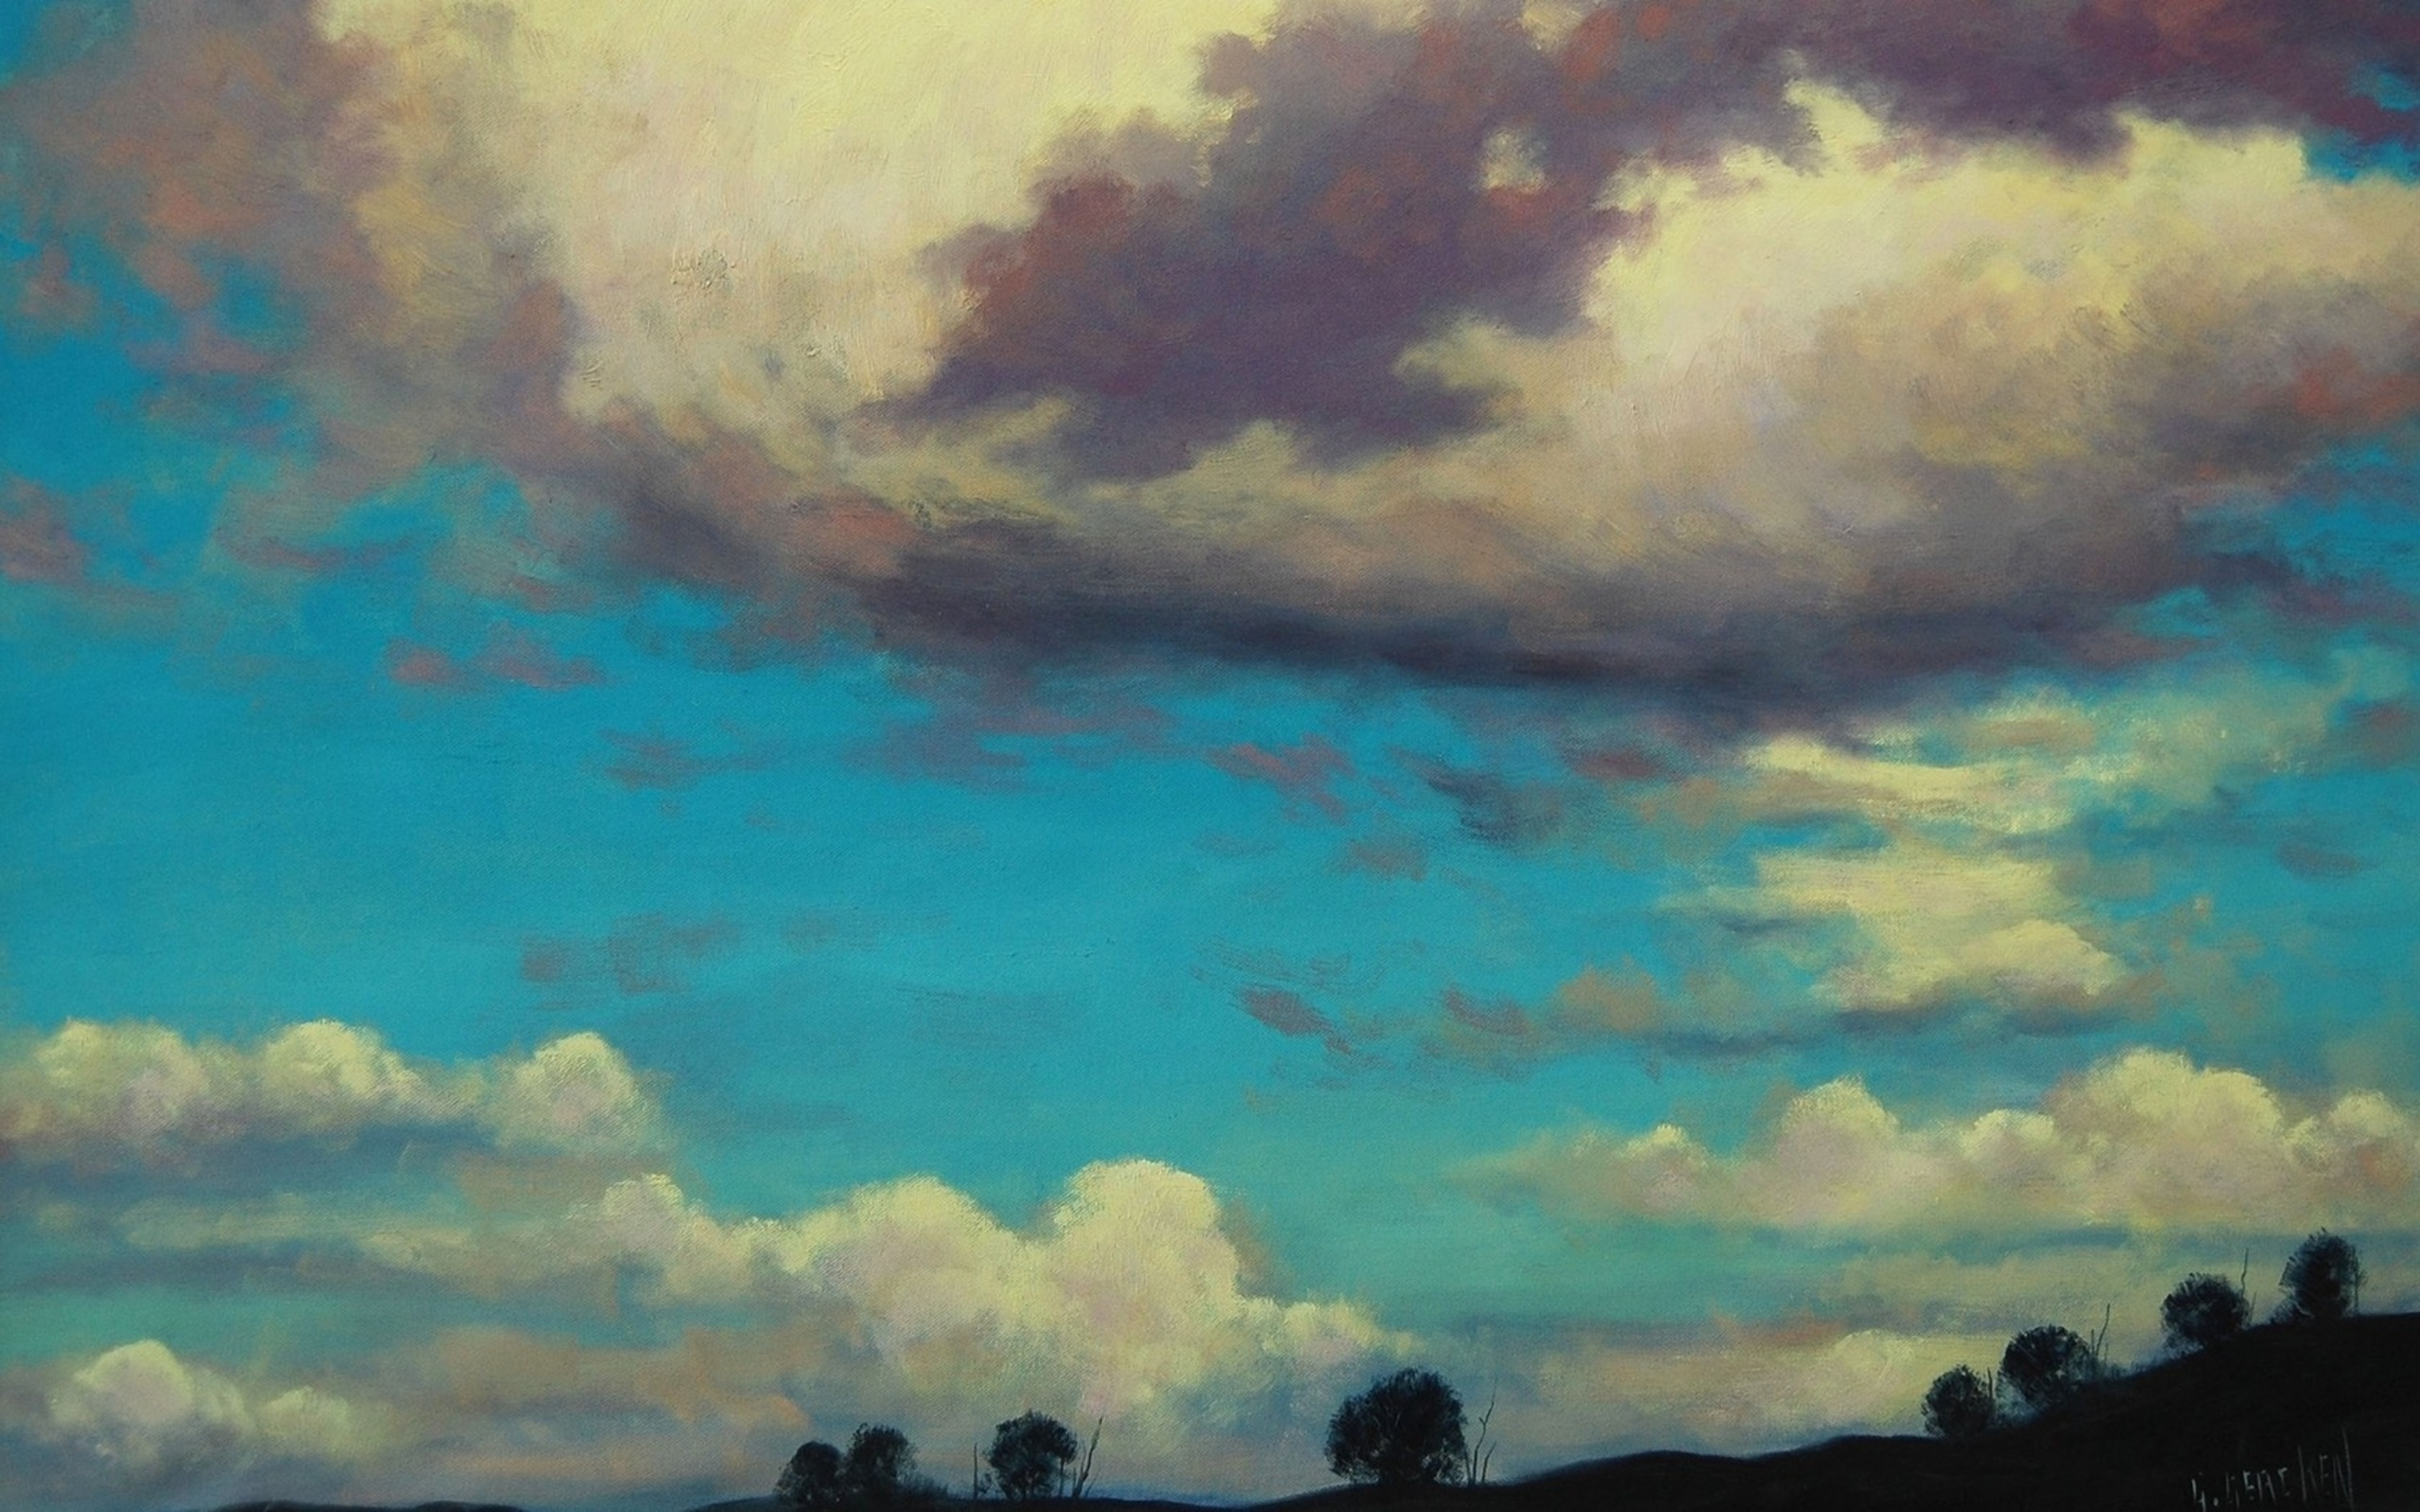 Earth Sky Wallpaperbackground 2560 X 1600 Id 411559